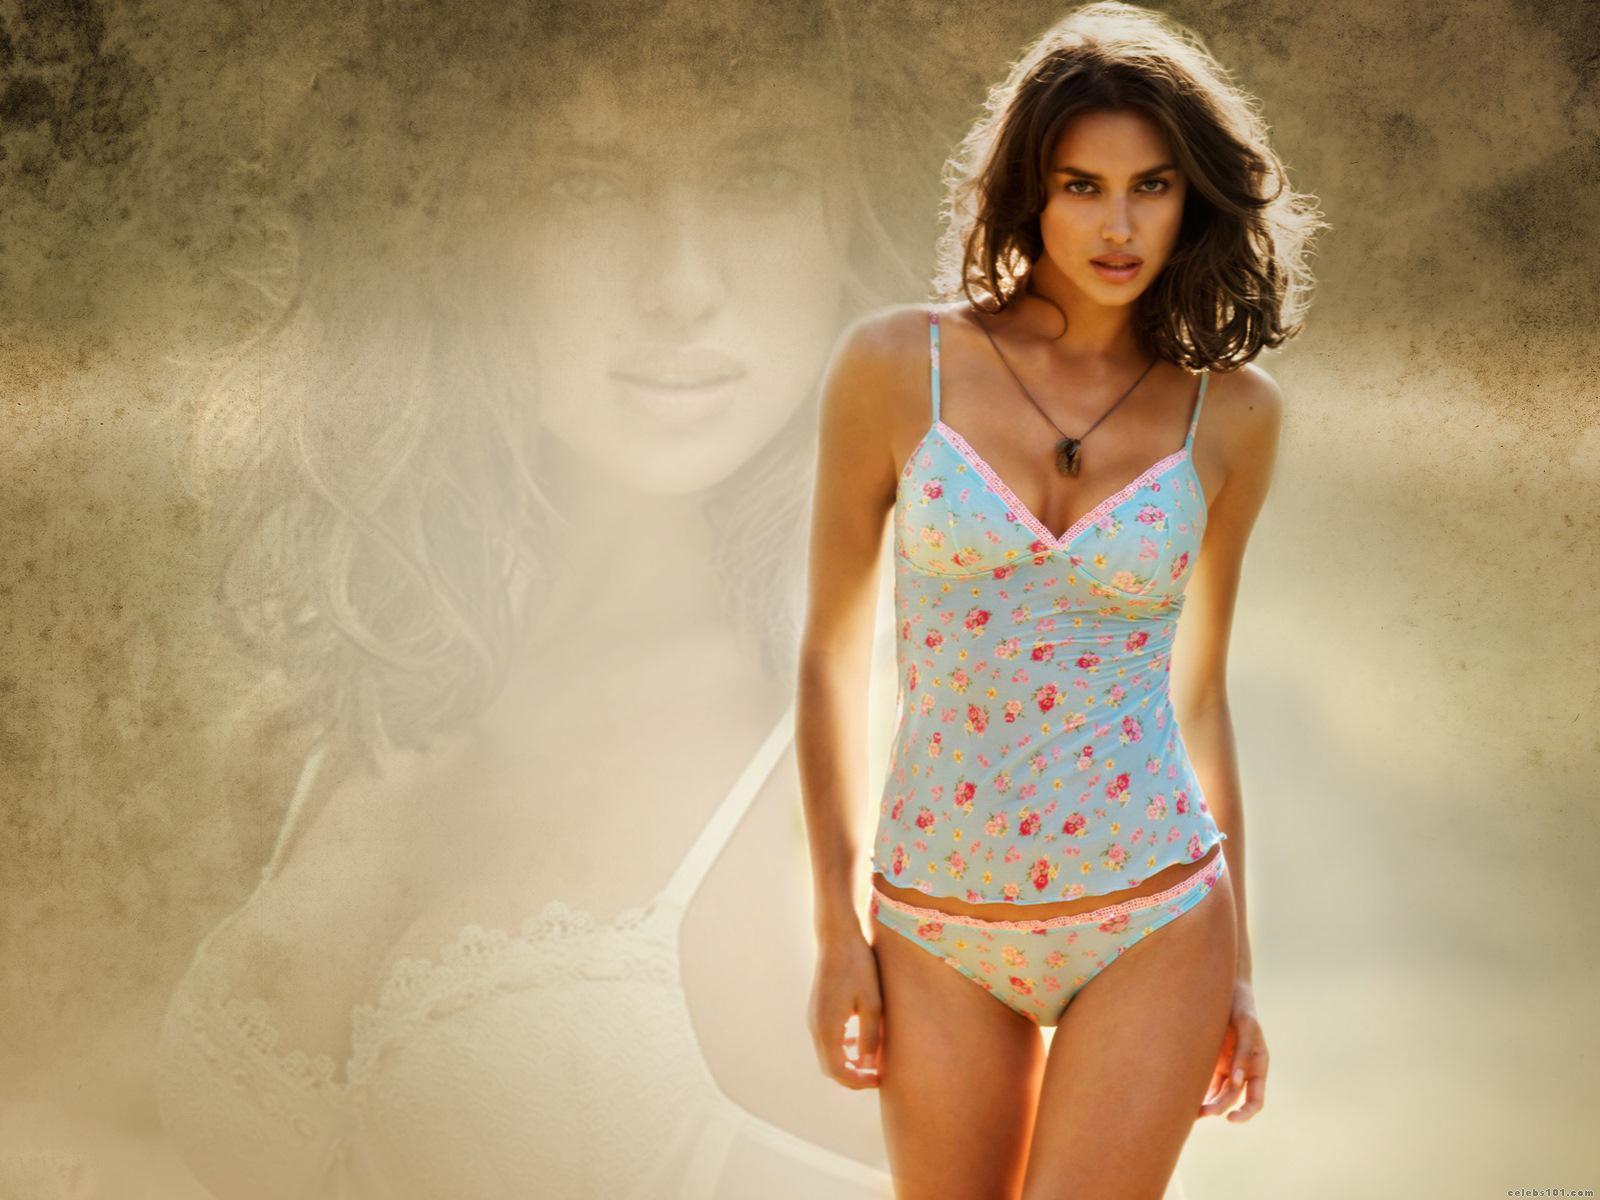 Russian Model Irina Shayk Wallpaper